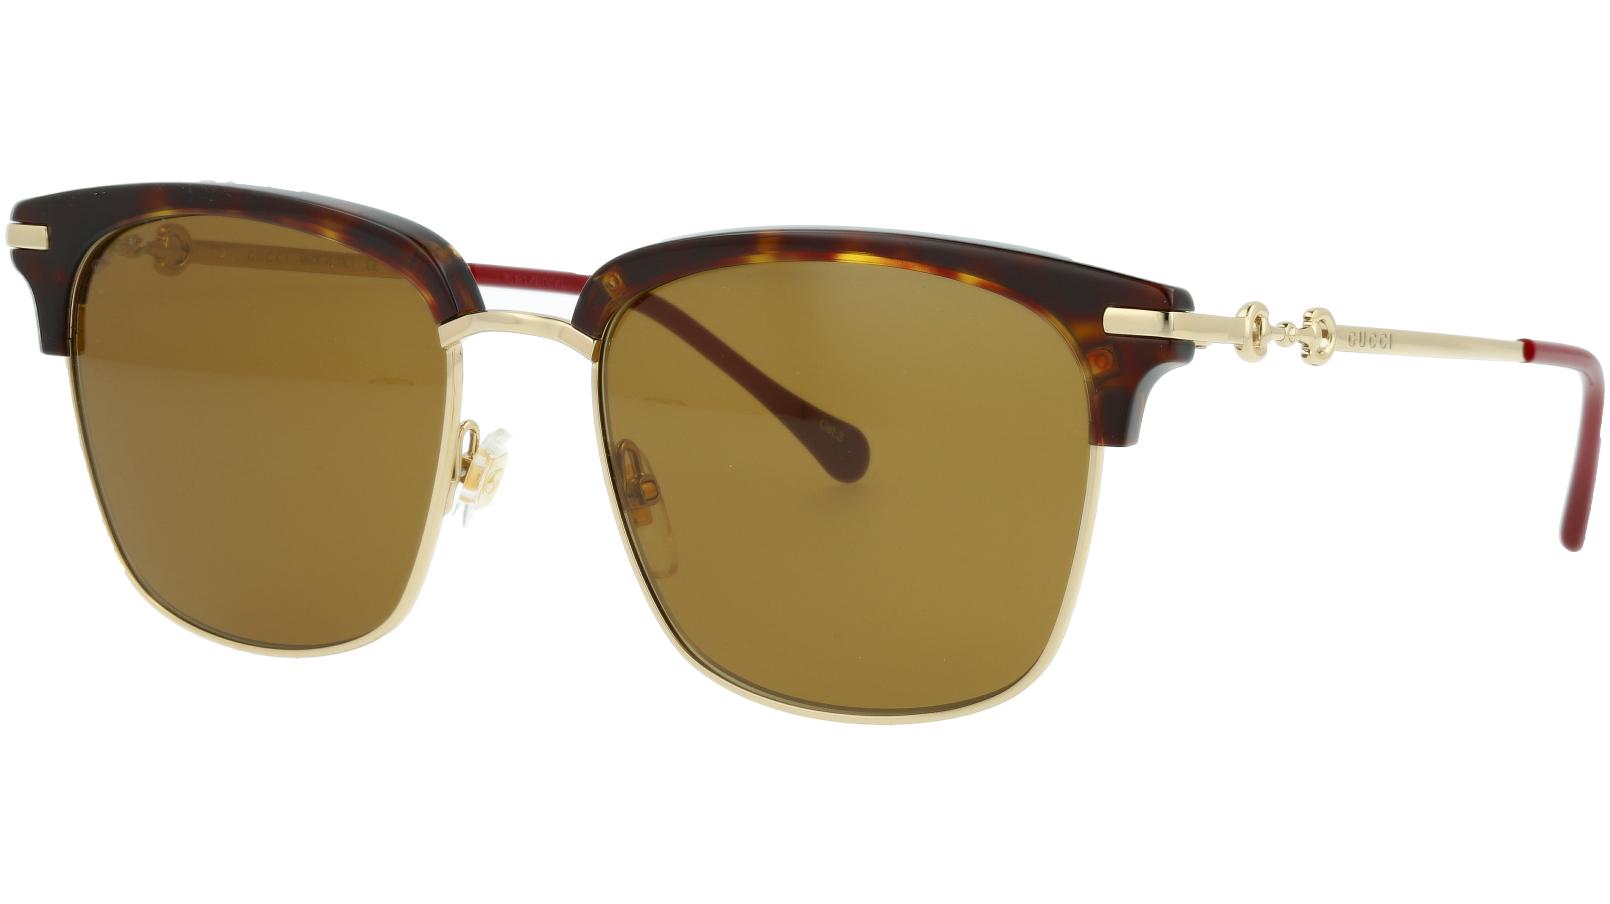 Gucci GG0918S 003 Burgundy Sunglasses